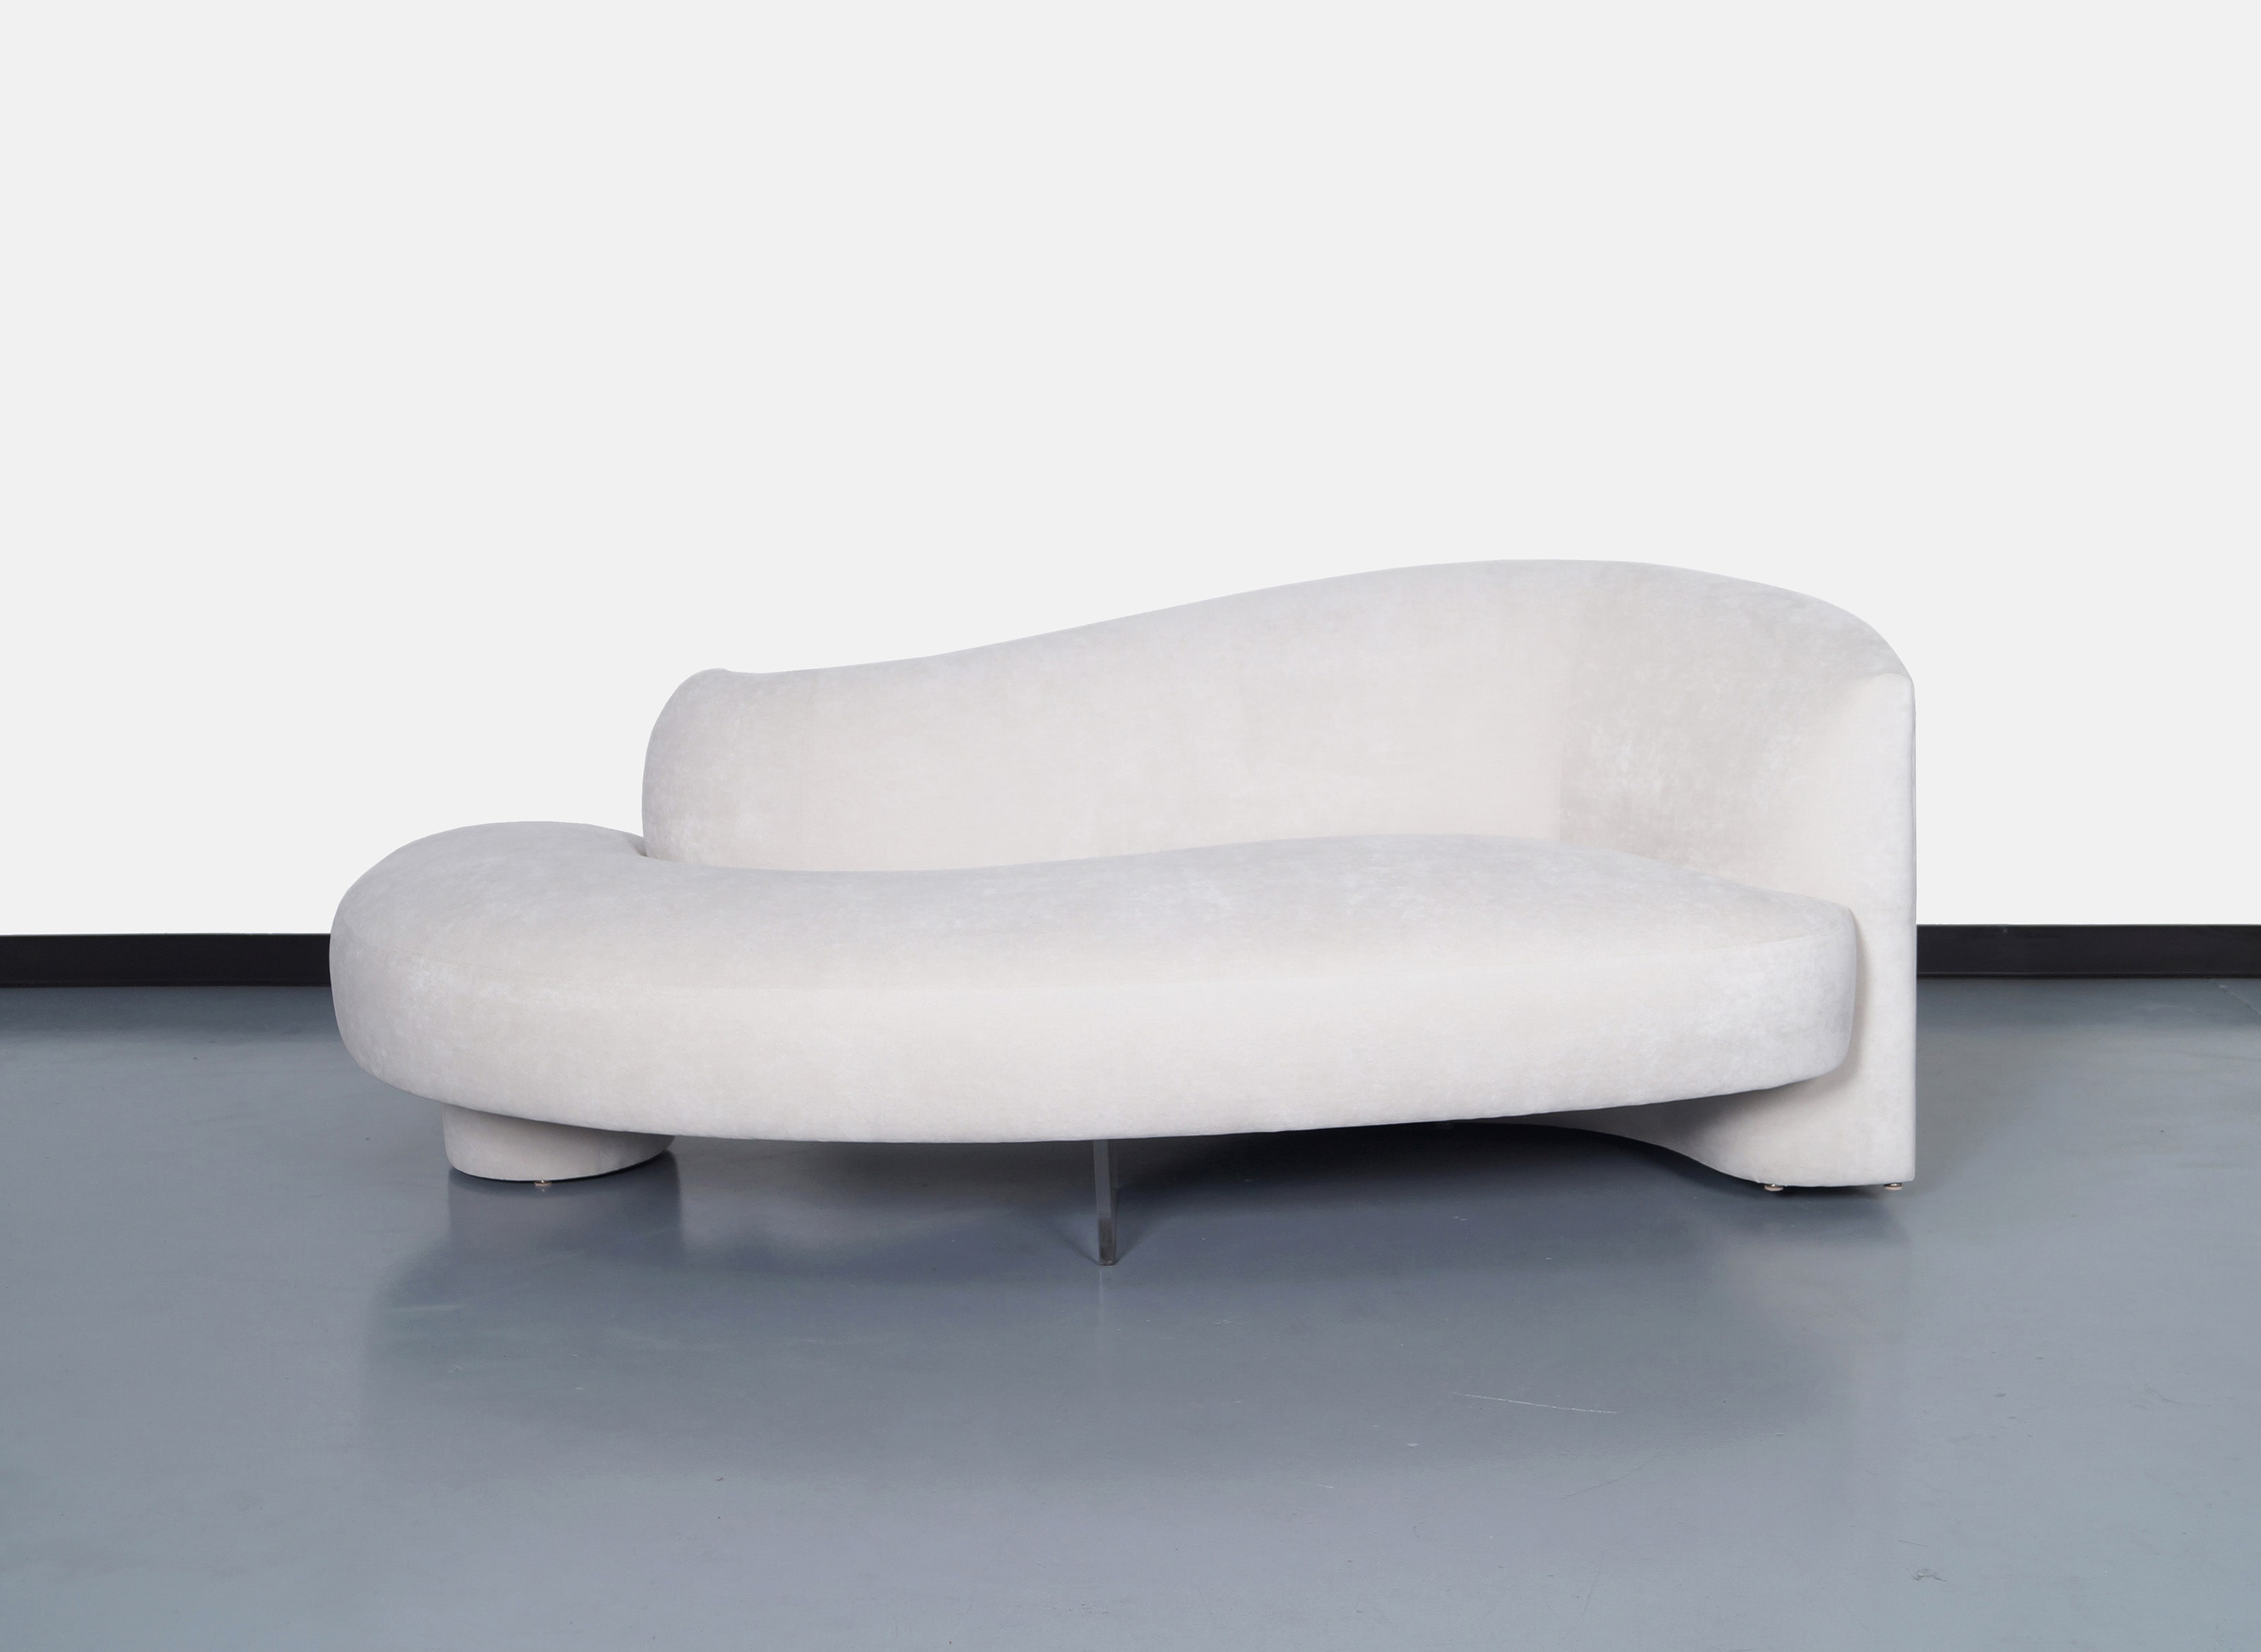 Vladimir Kagan Serpentine Sofa for Directional